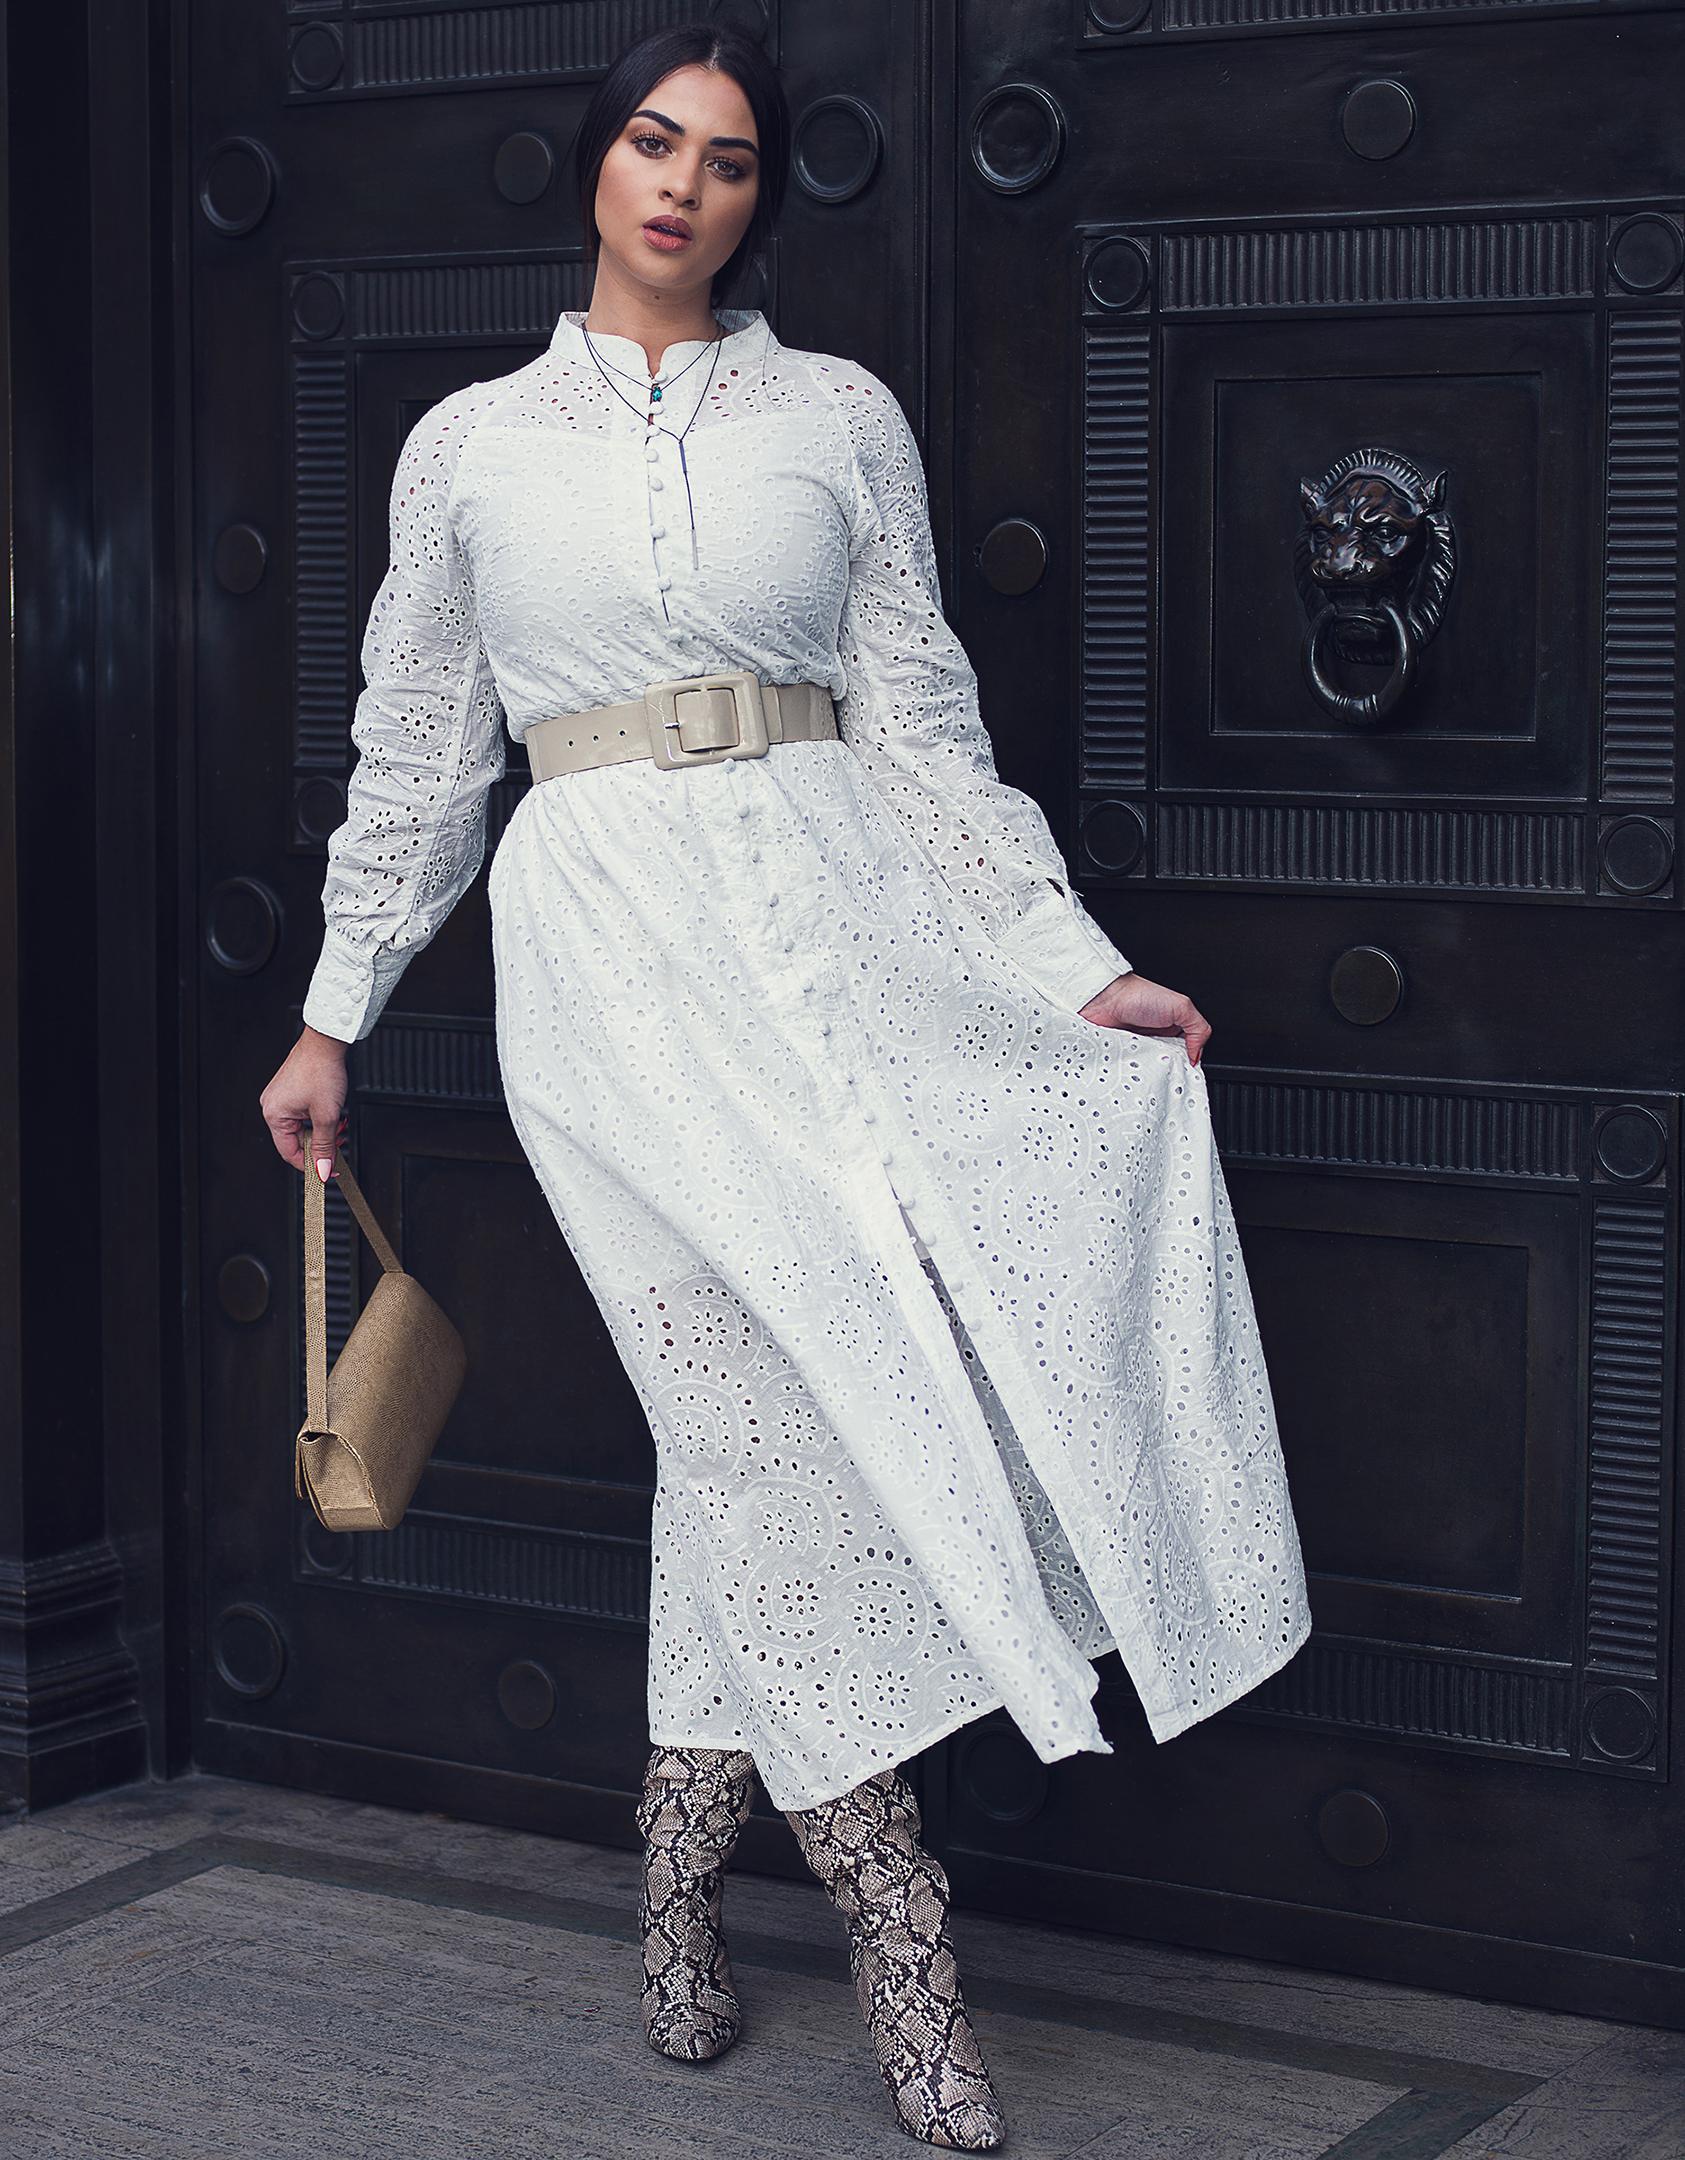 White dress editorial Geoff Nichols Photography